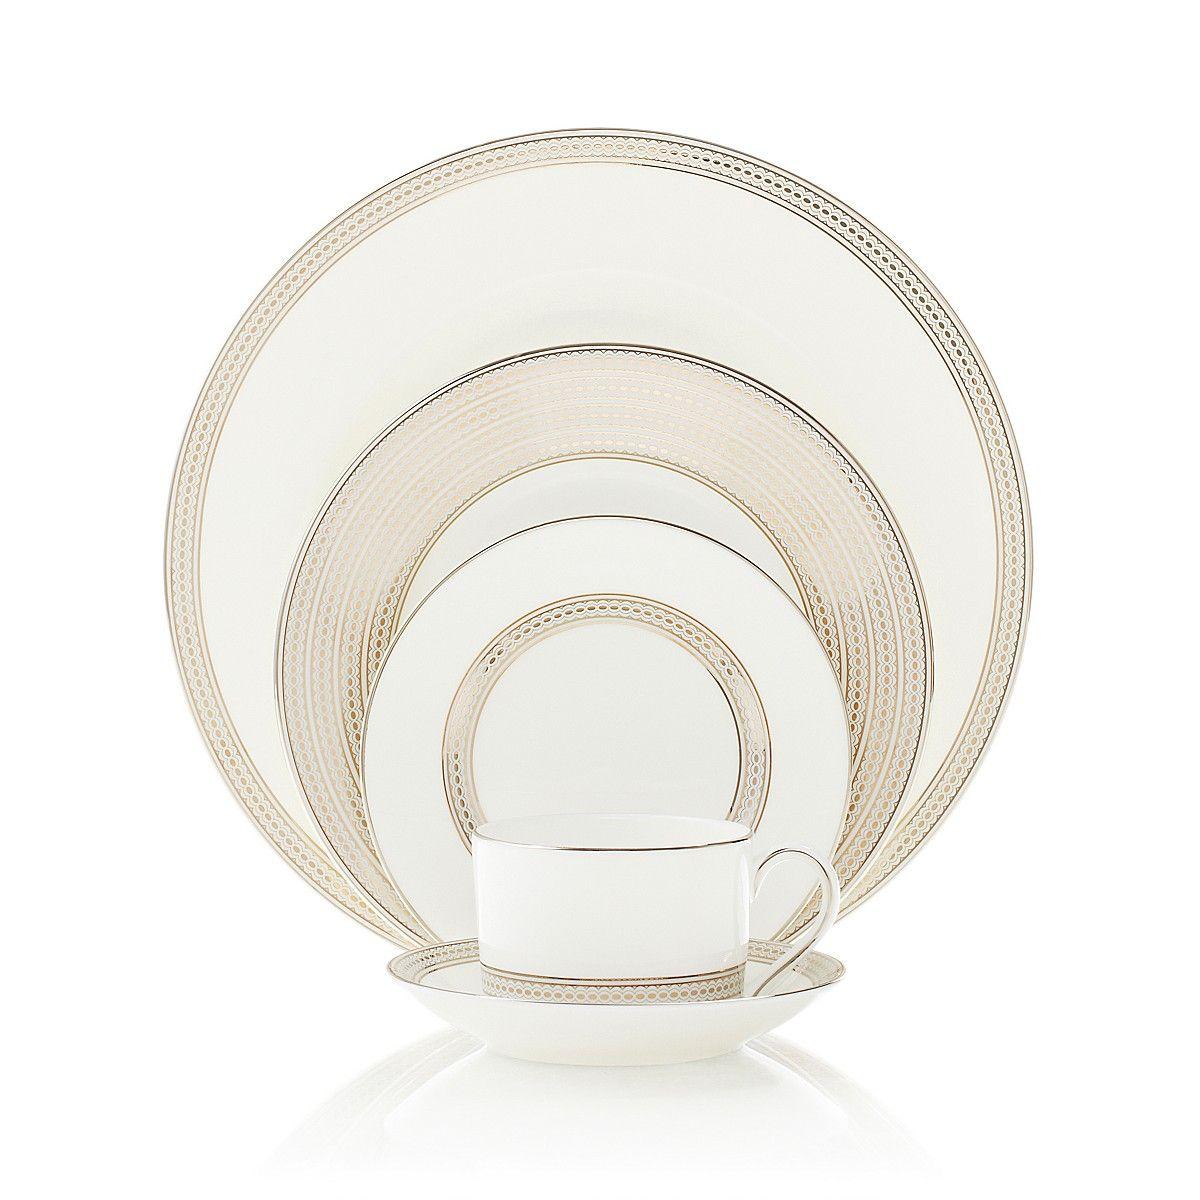 Vera Moderne Dinnerware Collection Wedgwood Dinnerware Tableware